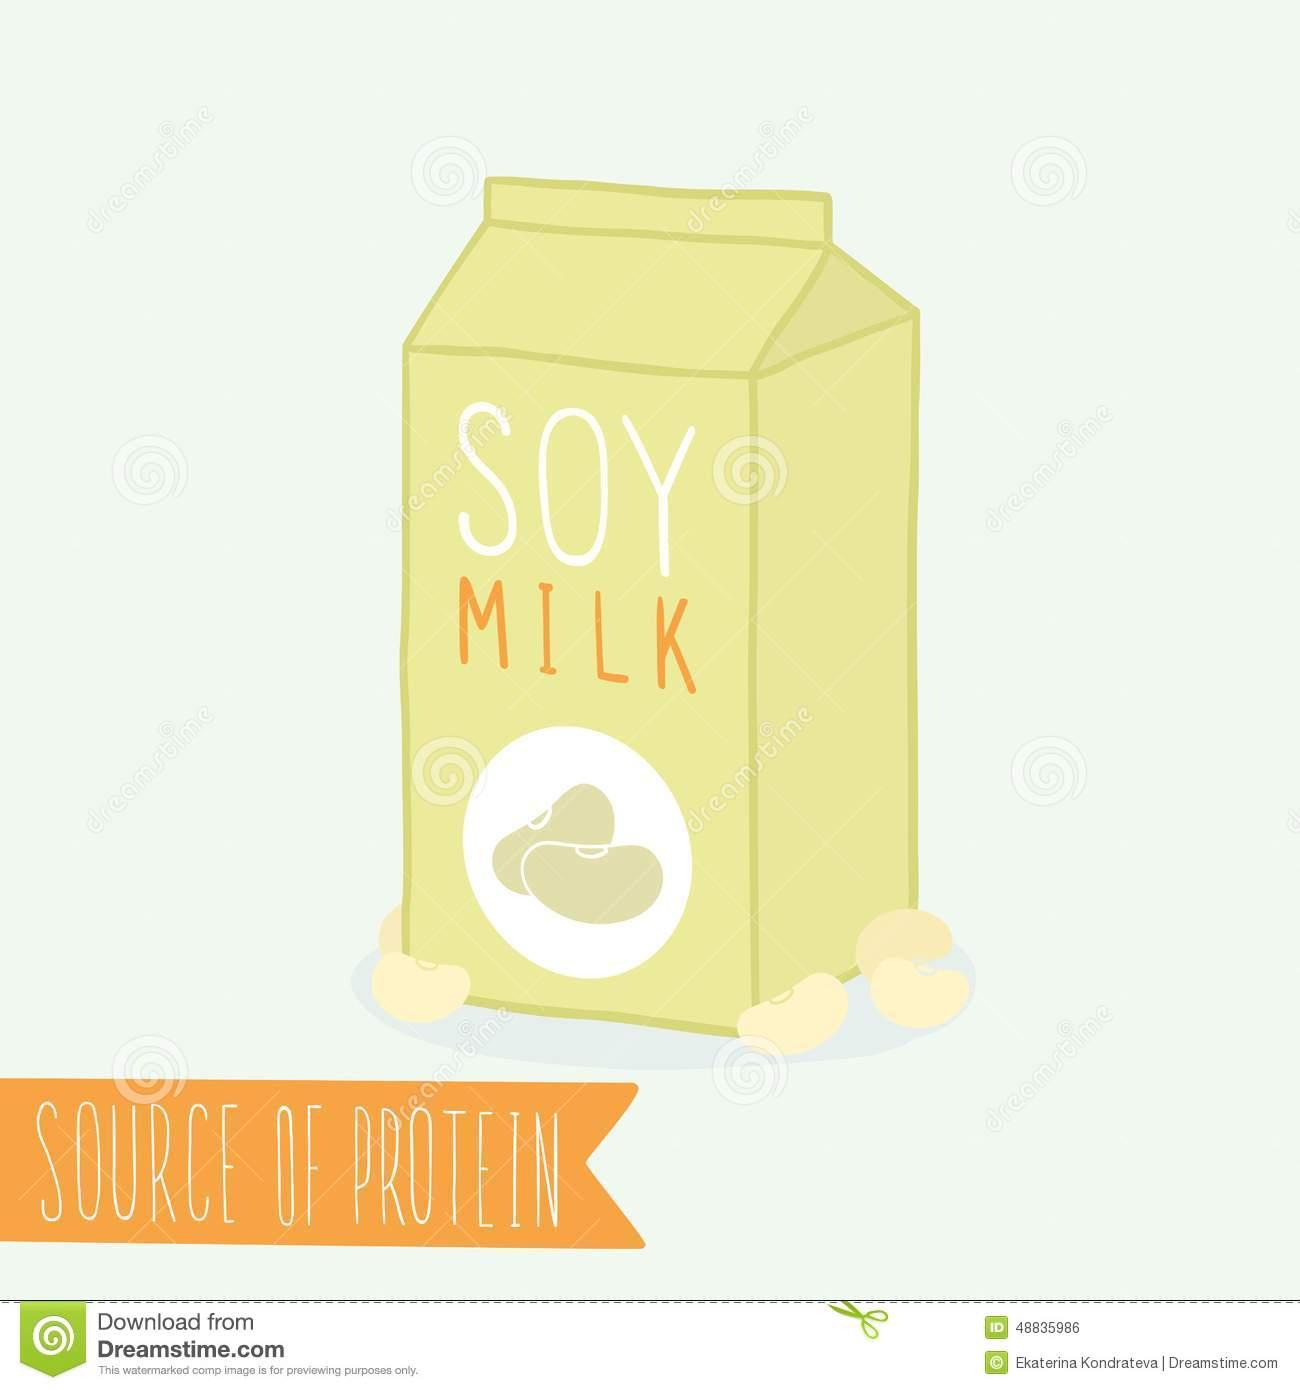 Clip art library . Milk clipart soy milk